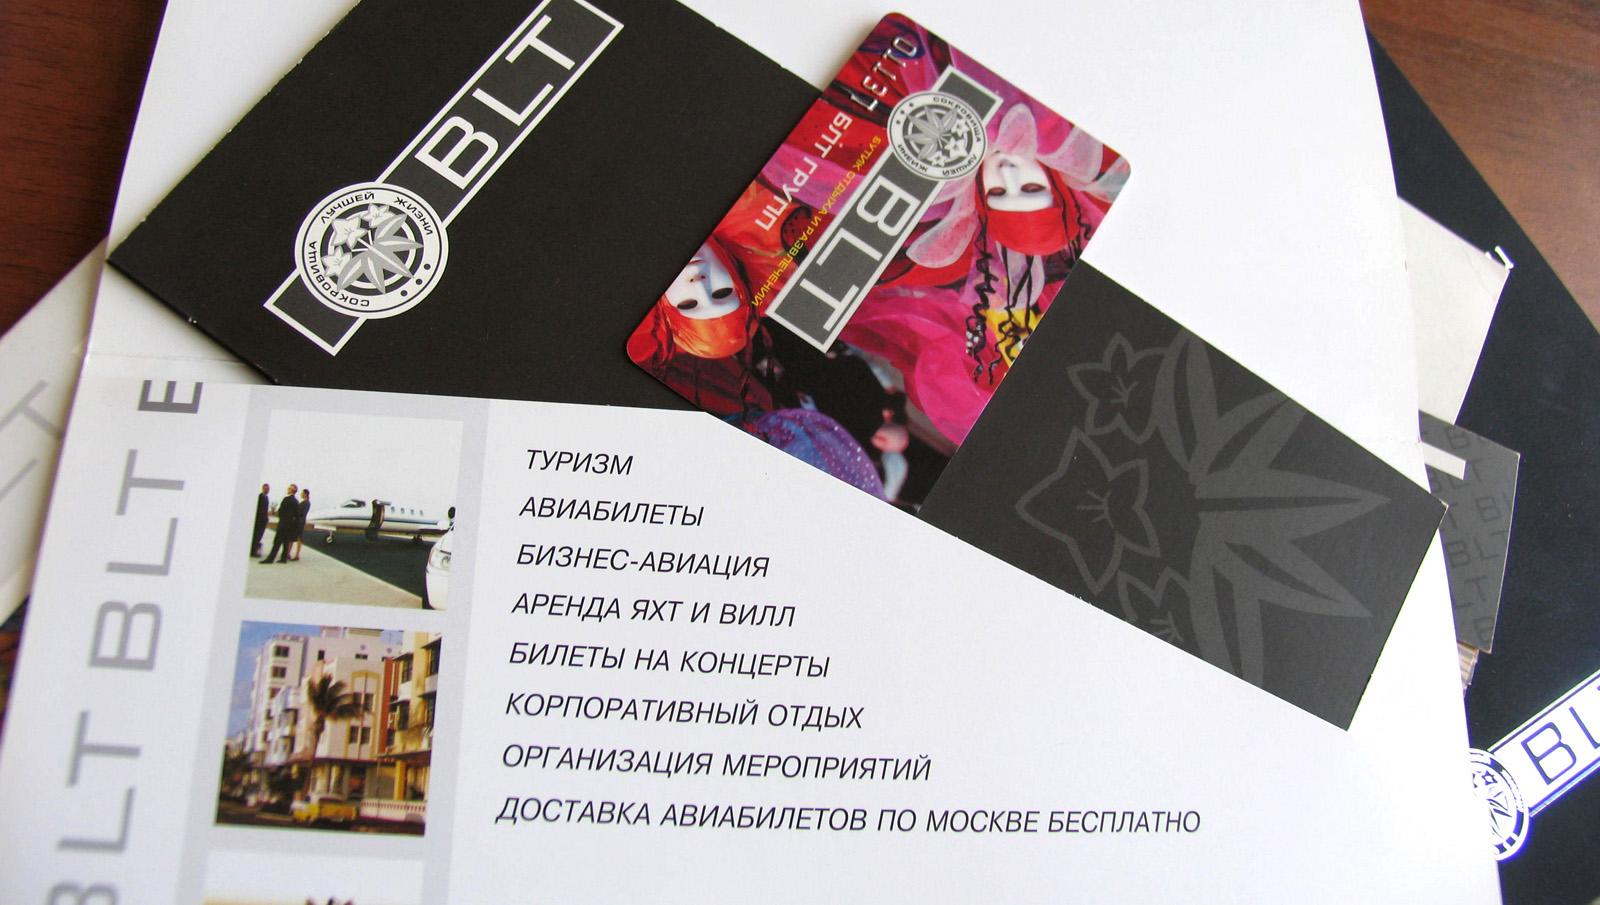 На заказ дизайн логотипа и корпоративного стиля, брендбук, листовки, сайт